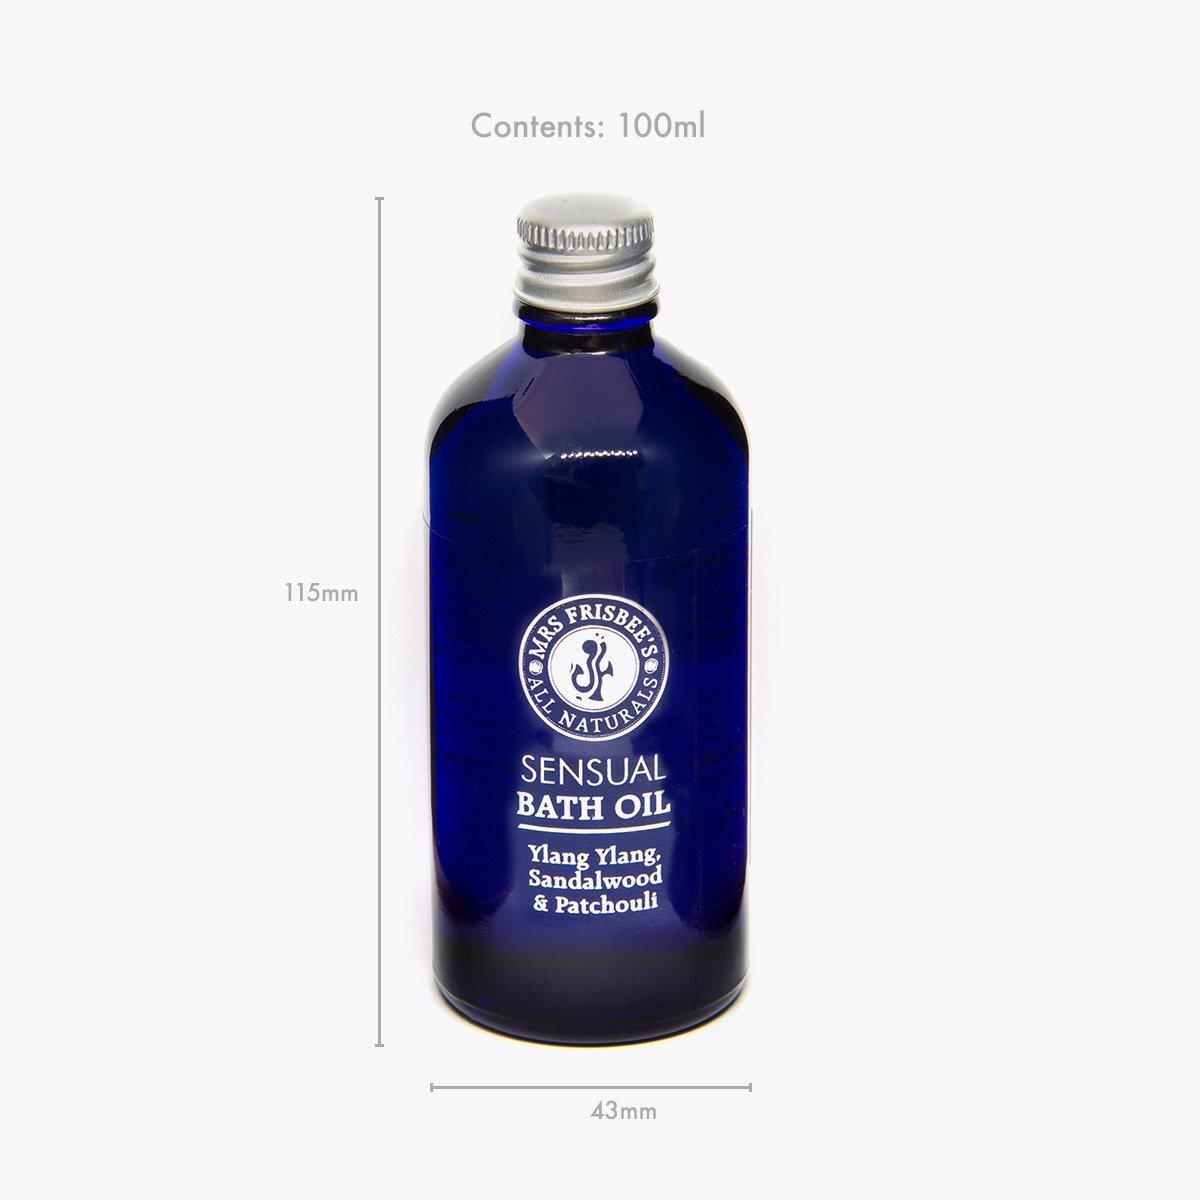 Sensual Bath Oil in glass bottle - product measurements